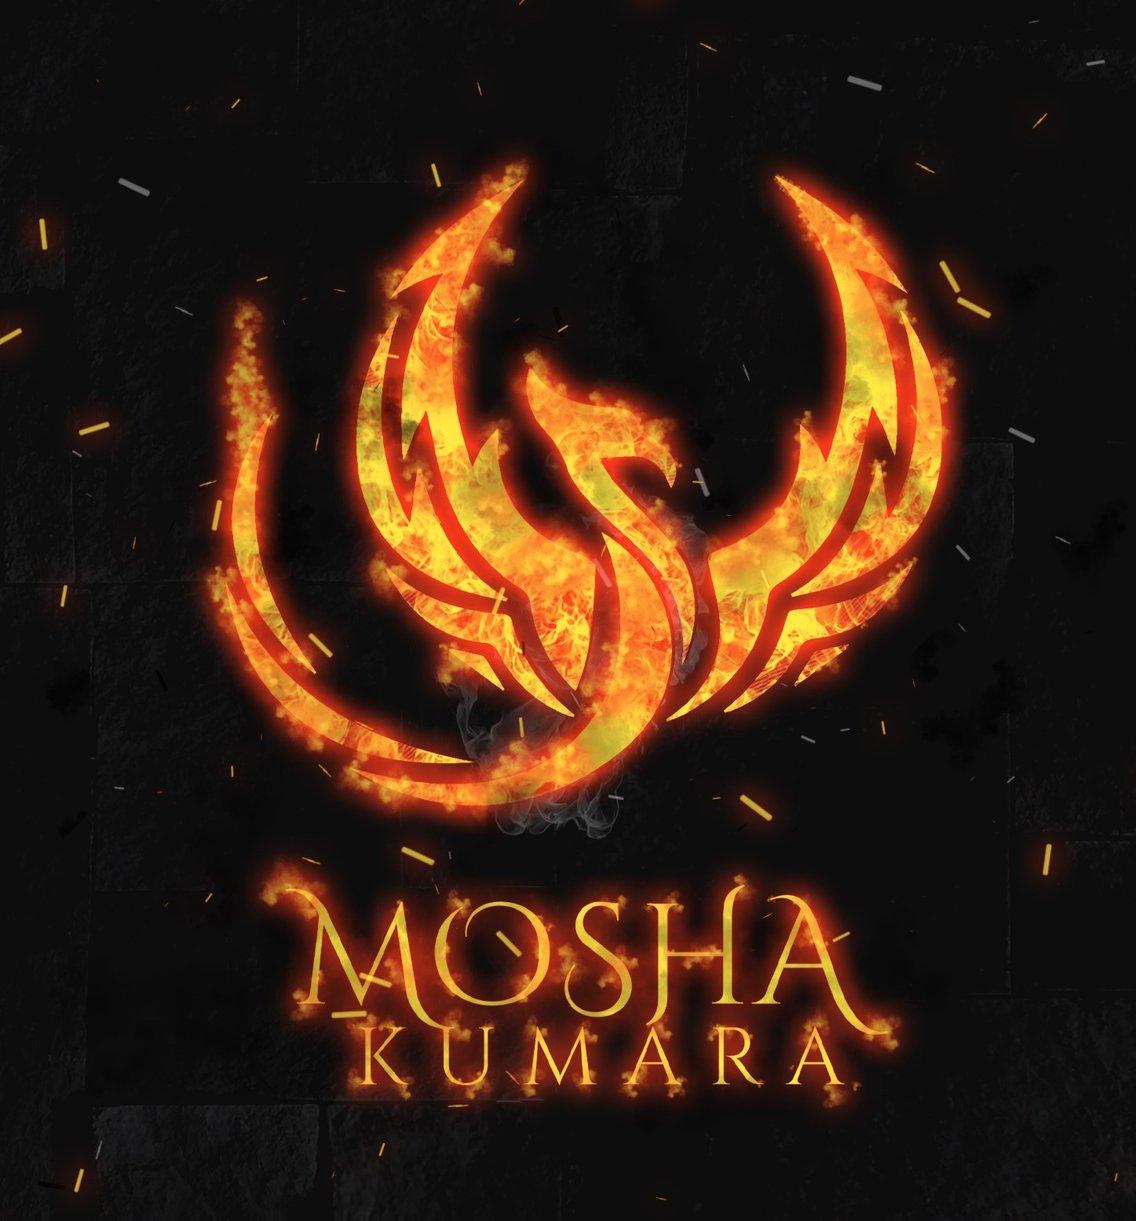 Mosha Kumara-Endiosando - imagen de portada